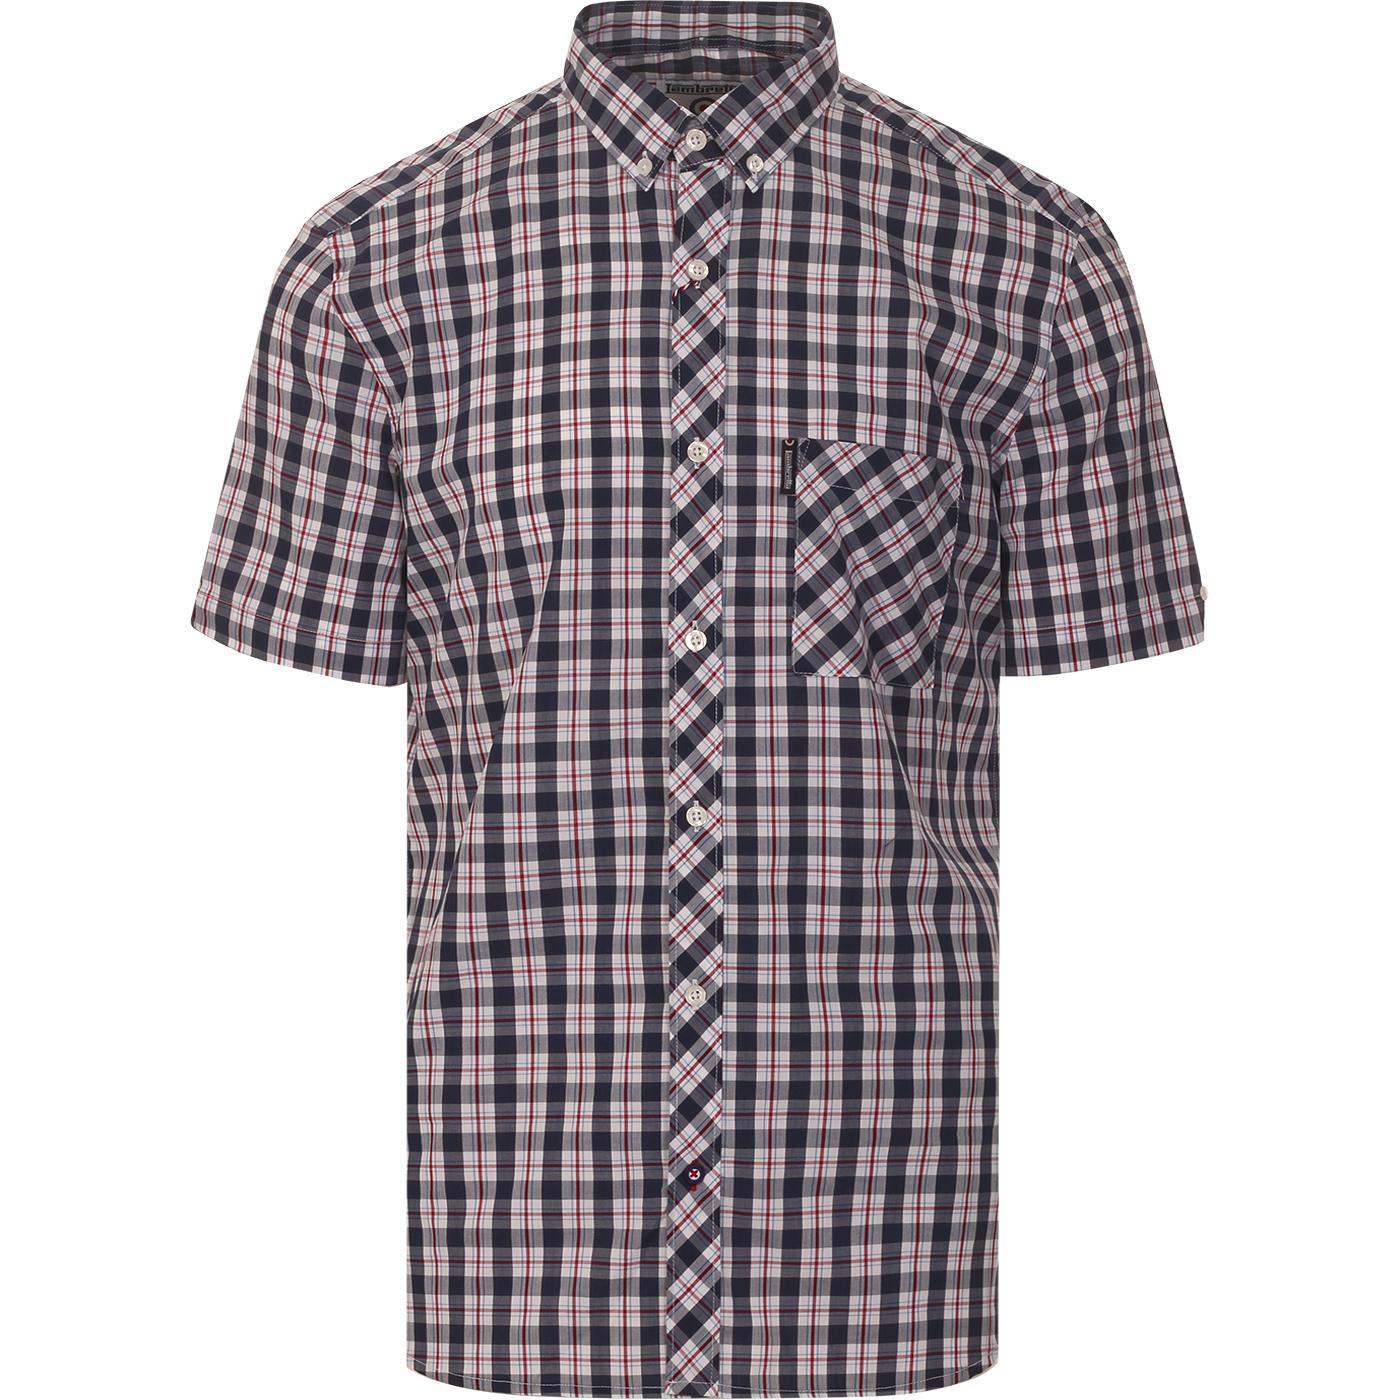 LAMBRETTA Mod S/S Plaid Check Shirt (Navy/Red)